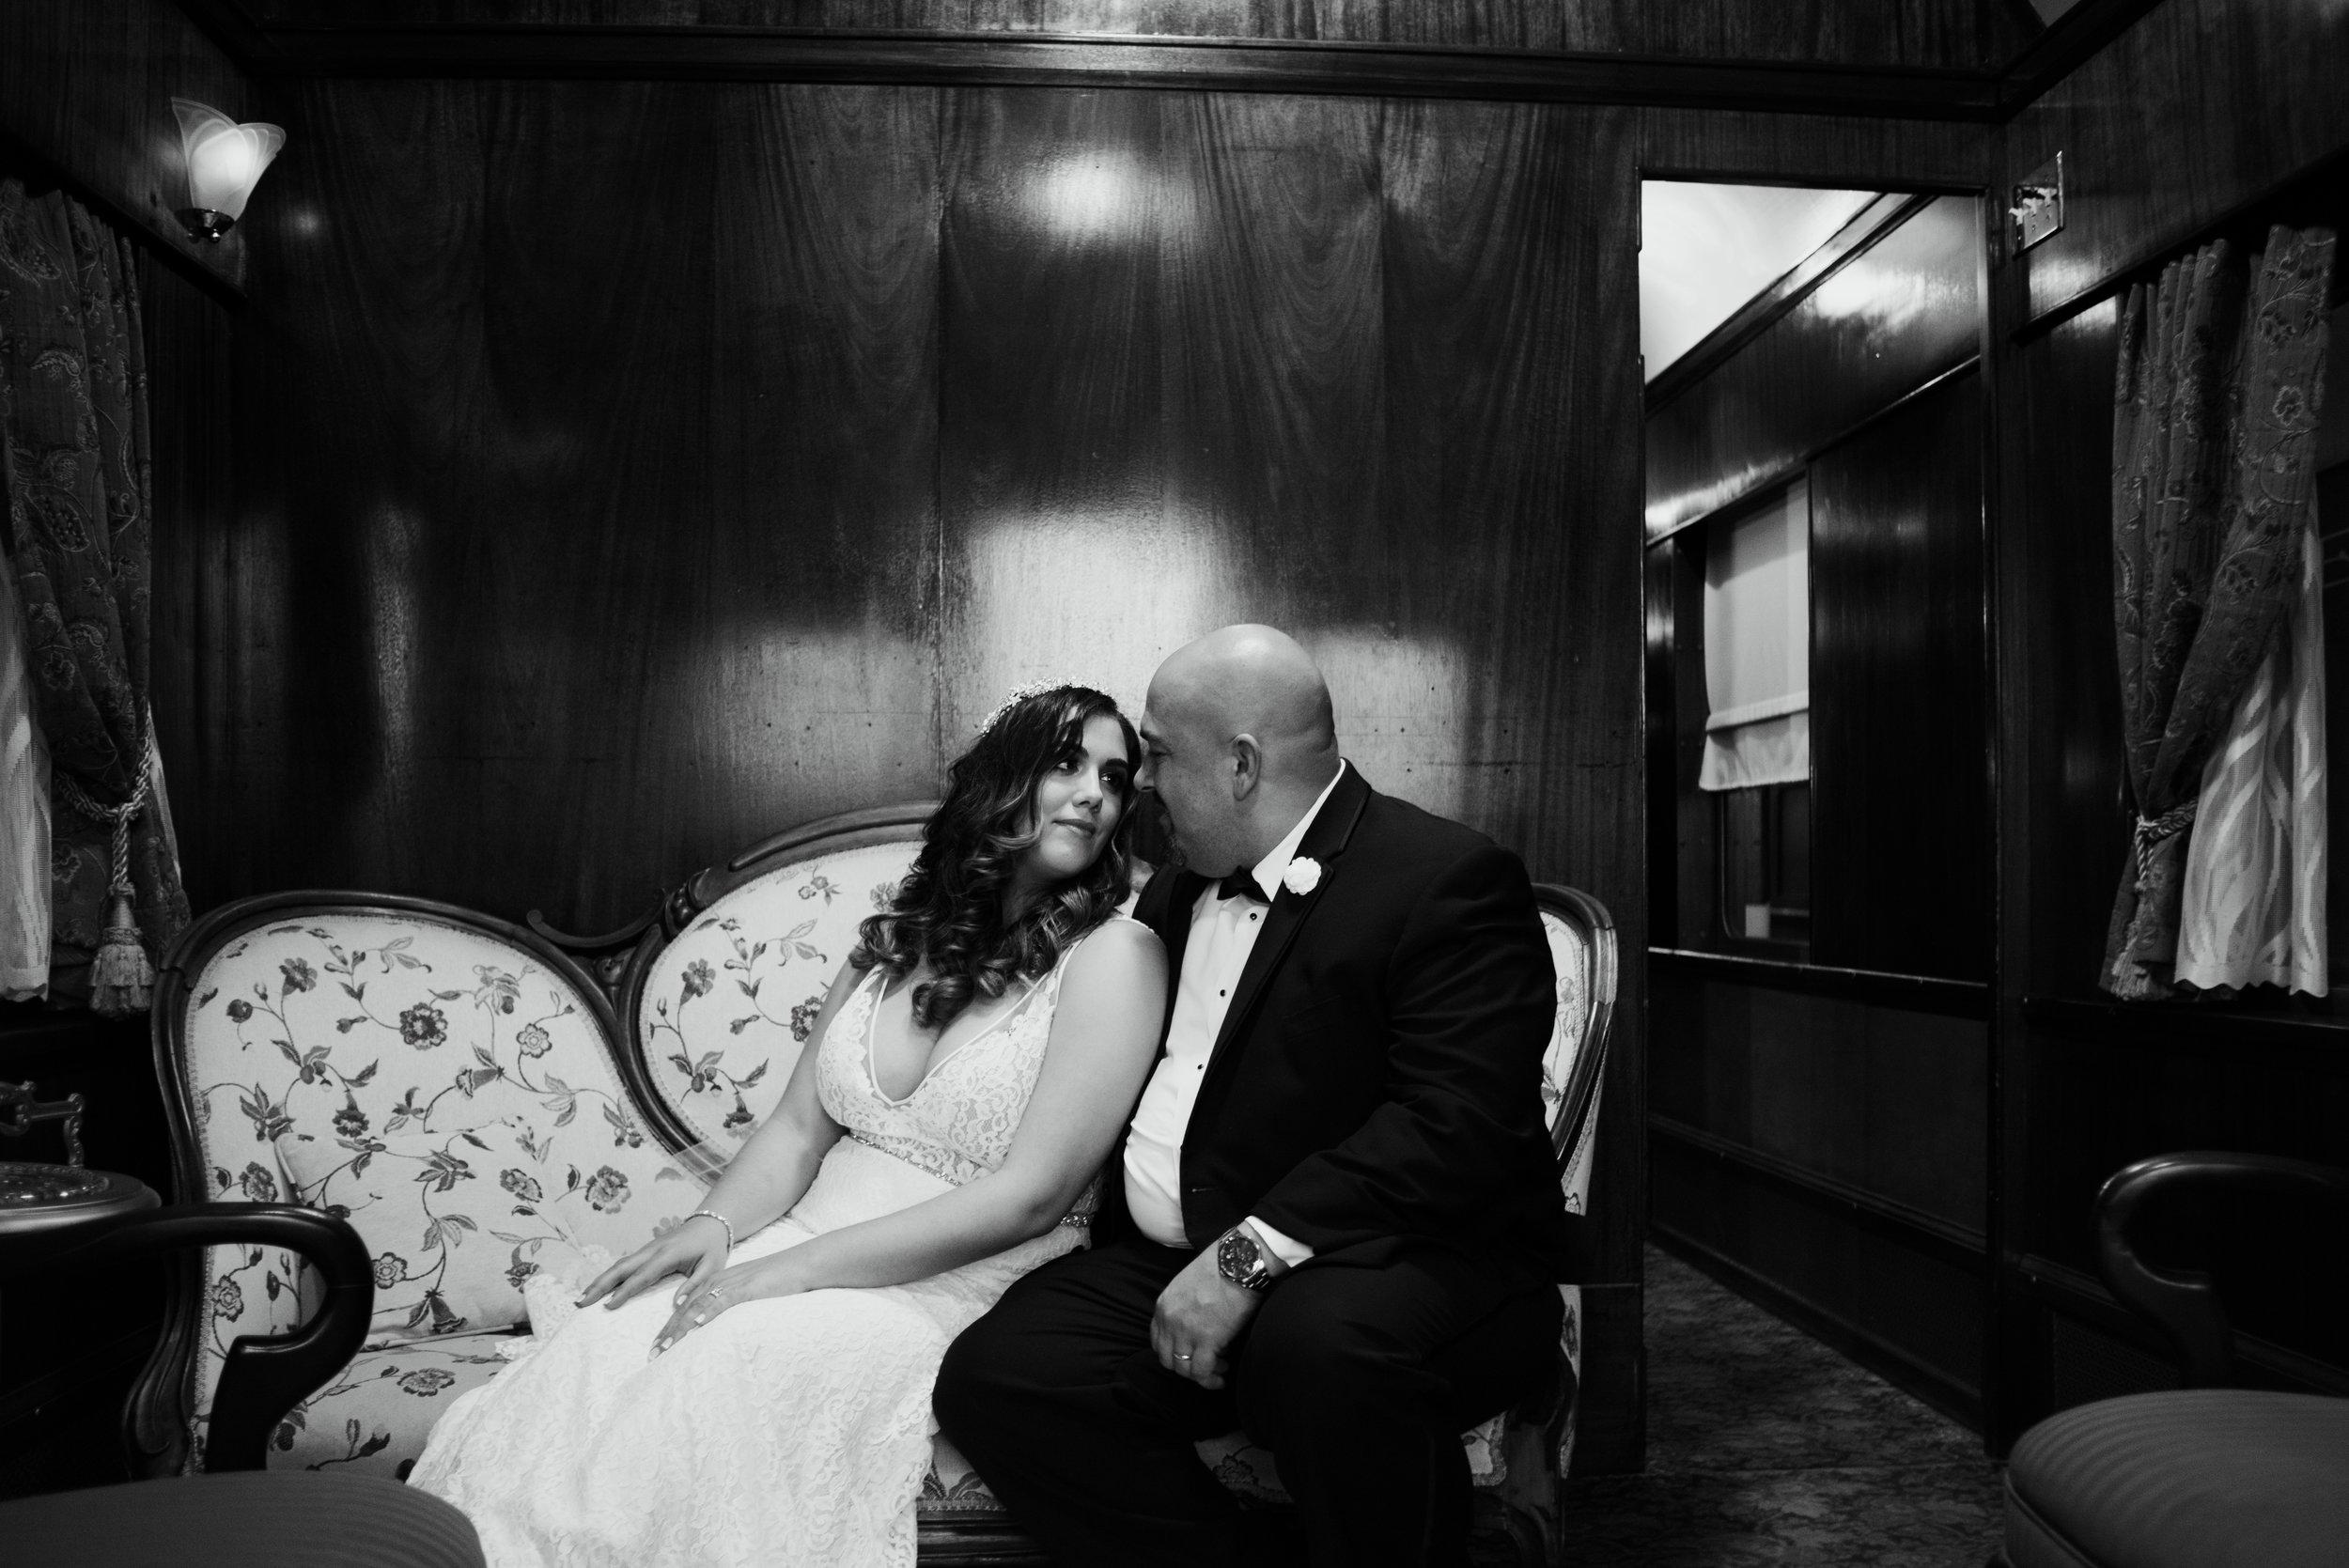 Iggy-and-yesenia-savannah-railroad-museum-wedding-meg-hill-photo- (762 of 1037).jpg